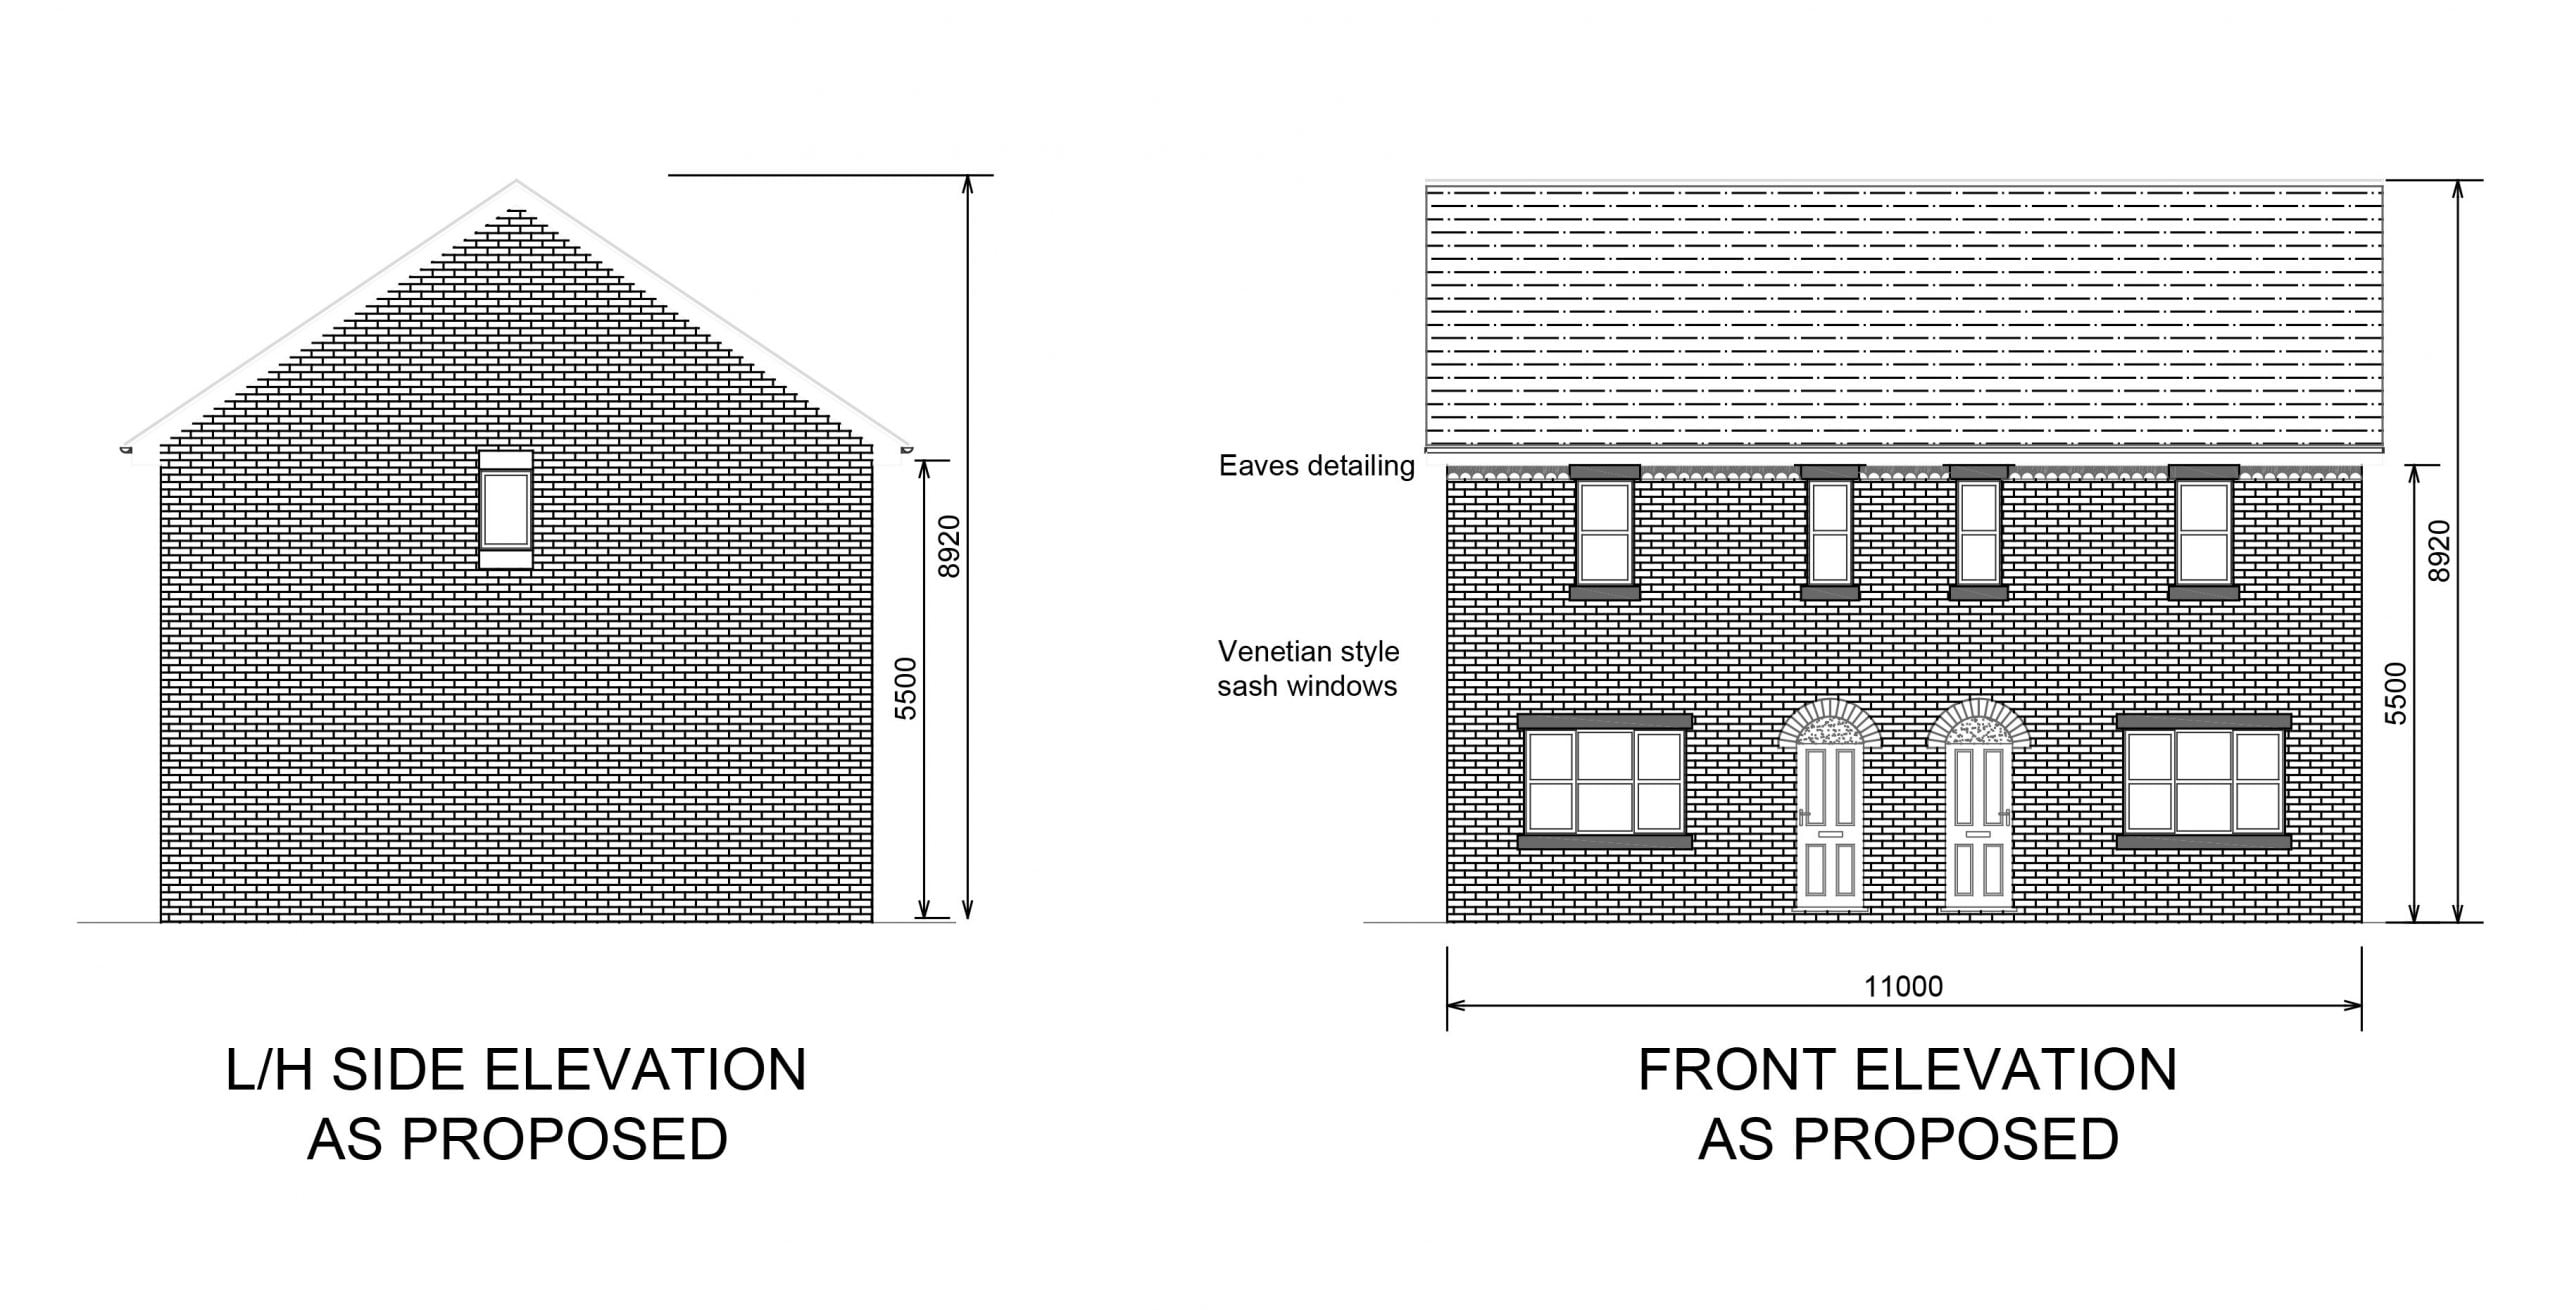 Townfield Lane, Barnton new build housing development